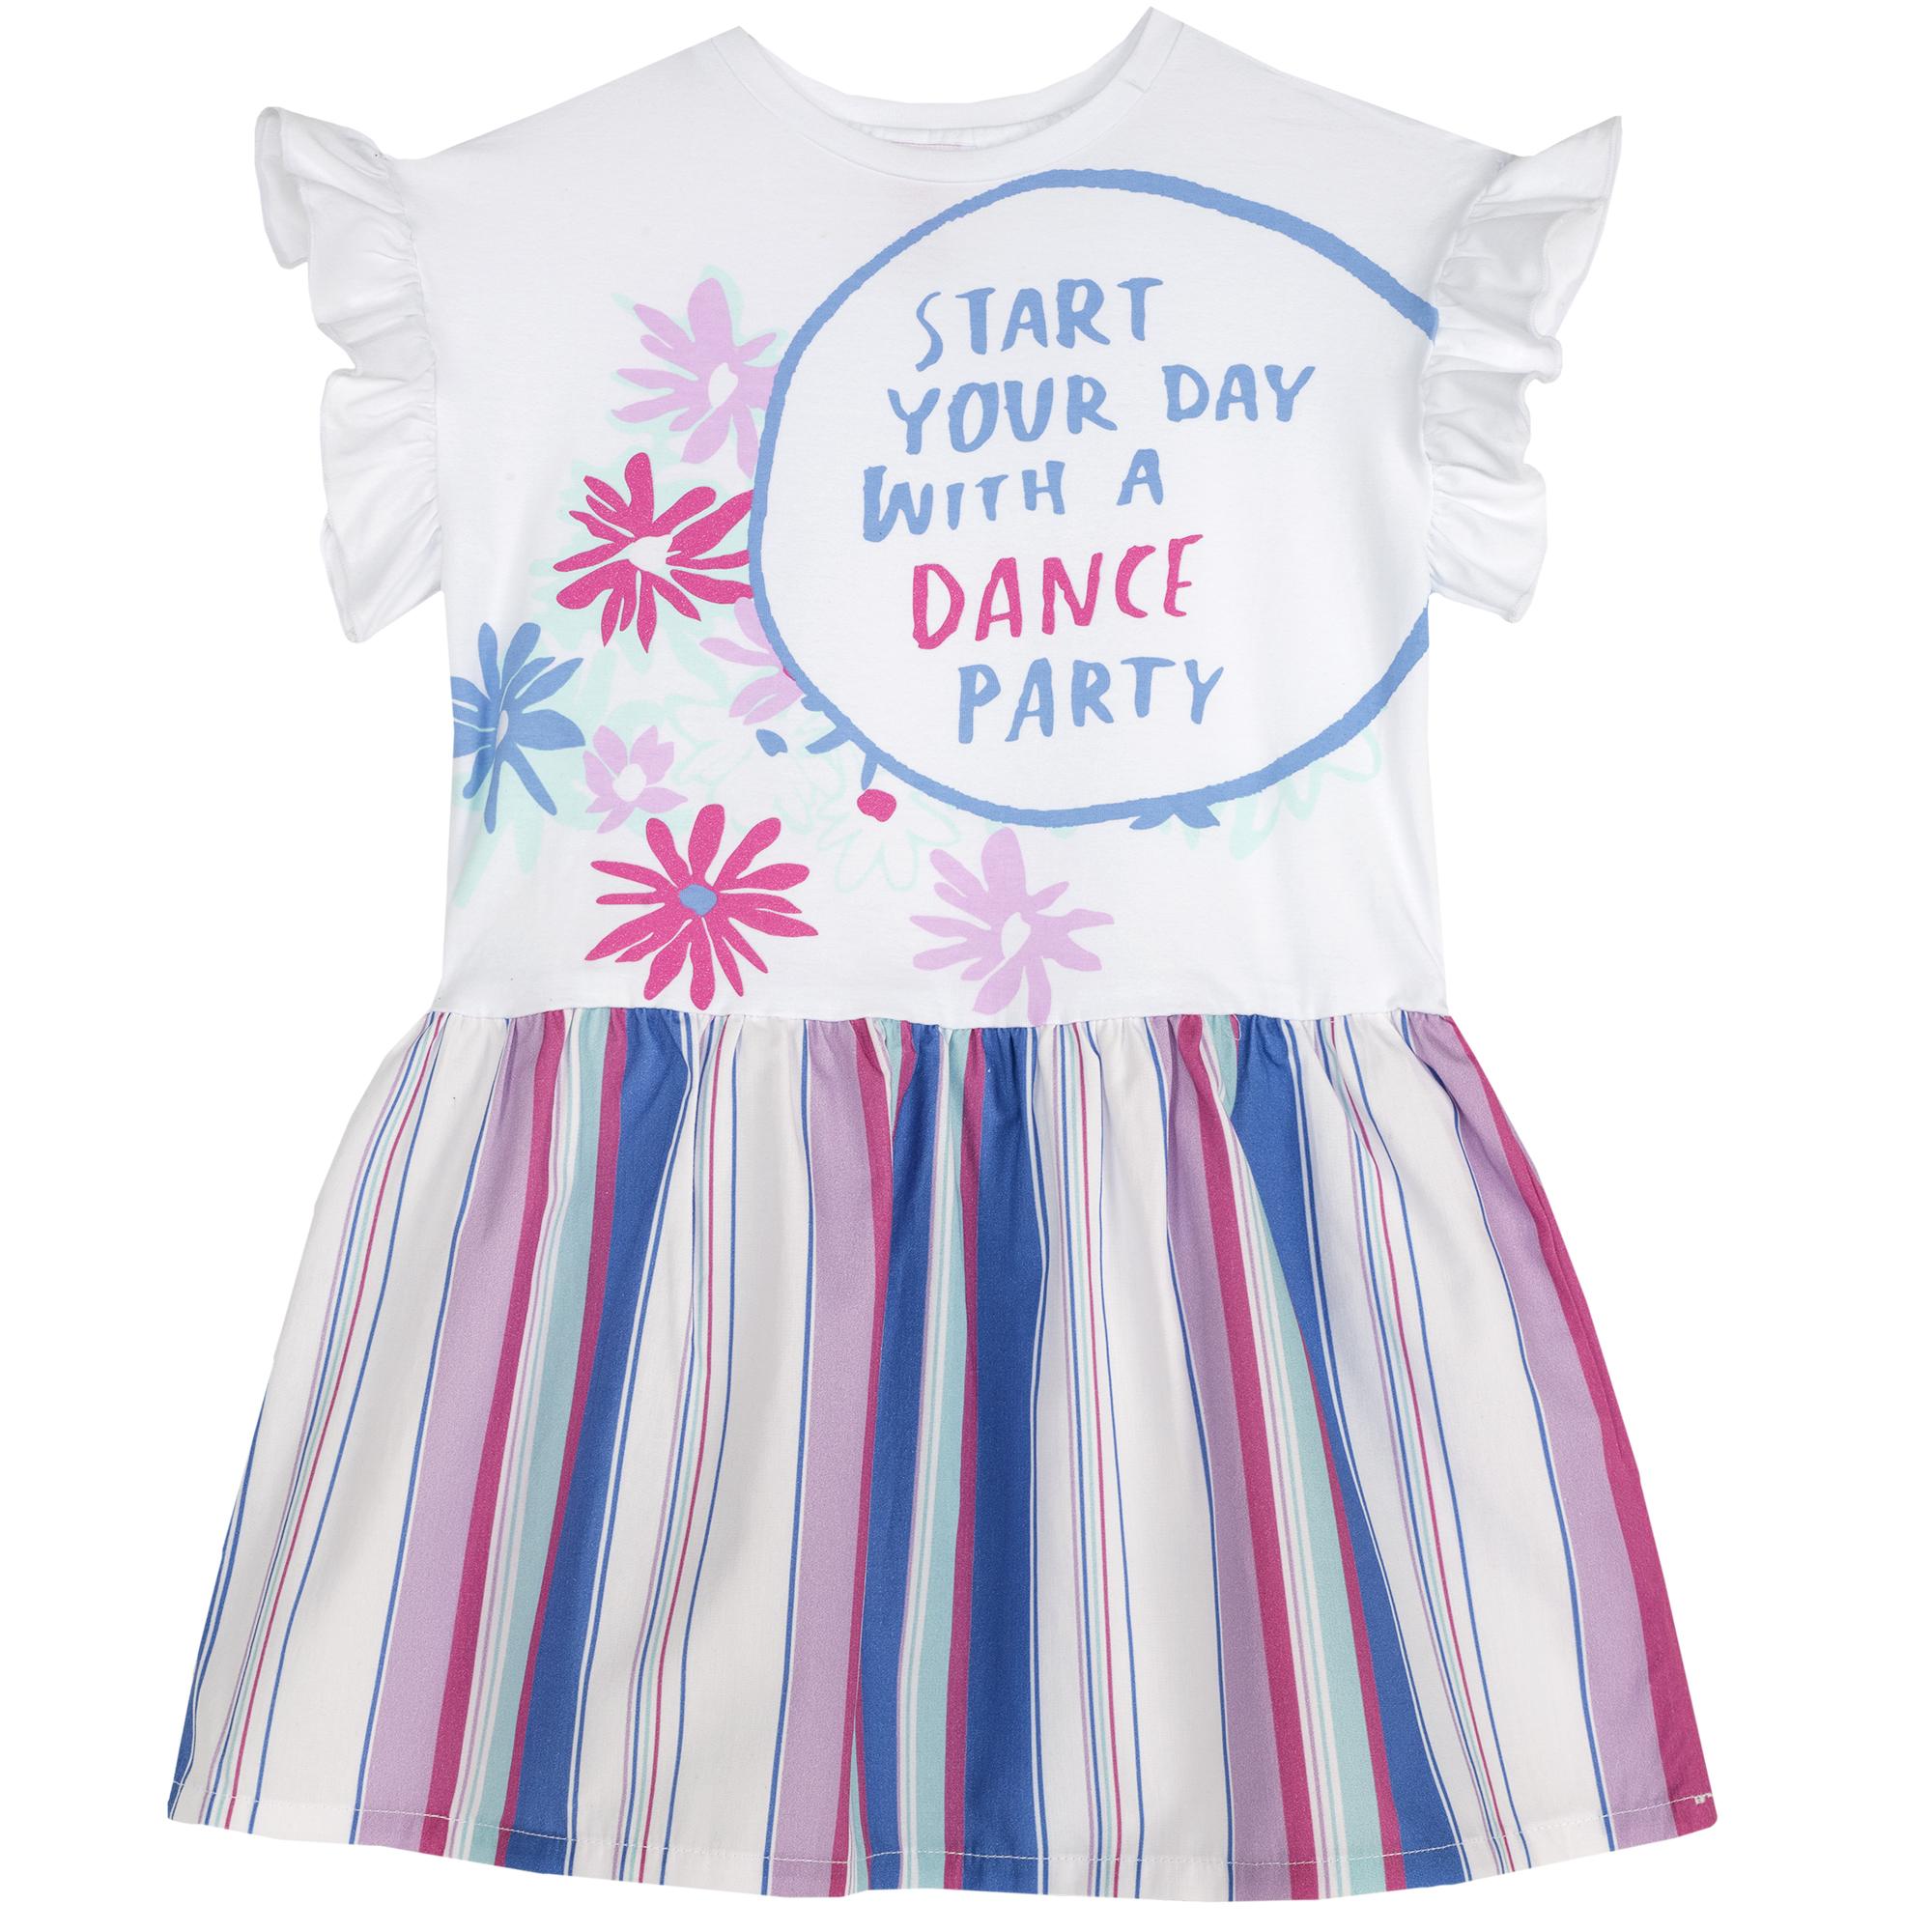 Rochie copii Chicco, maneca scurta, volanase, multicolor, 03496